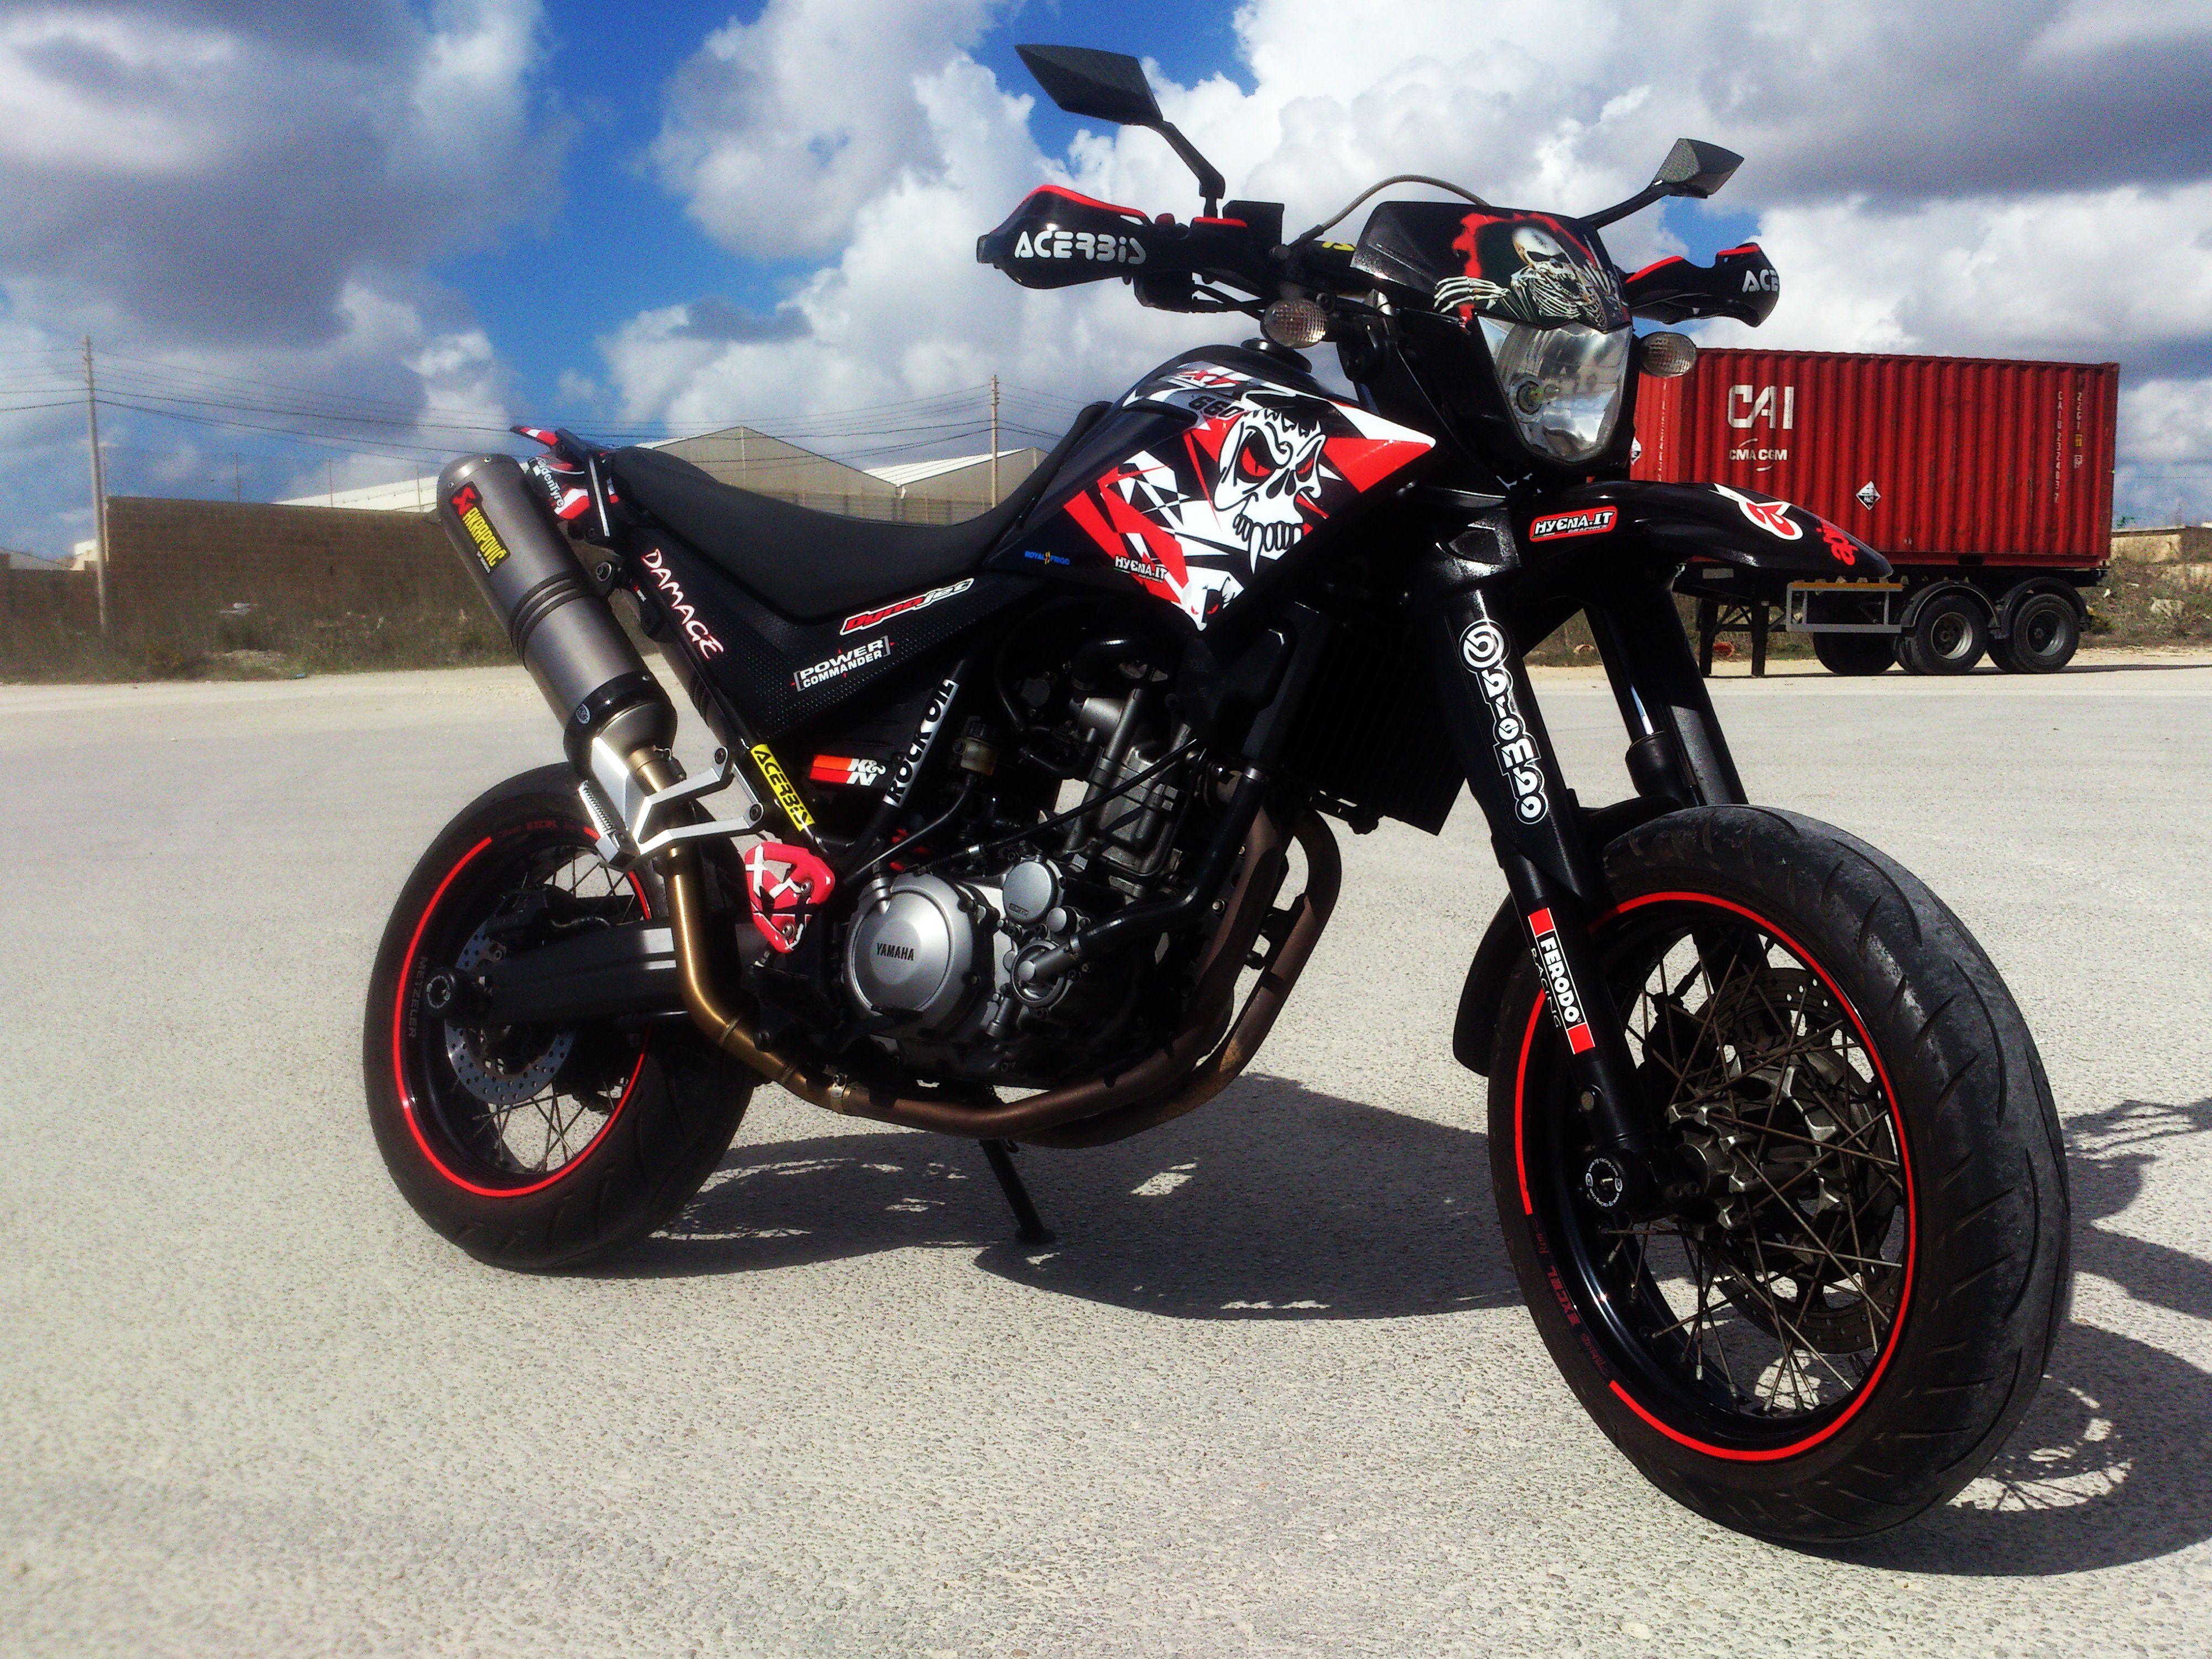 my customized yamaha xt660x yamaha xtx 660 yamaha motorcycle bike. Black Bedroom Furniture Sets. Home Design Ideas